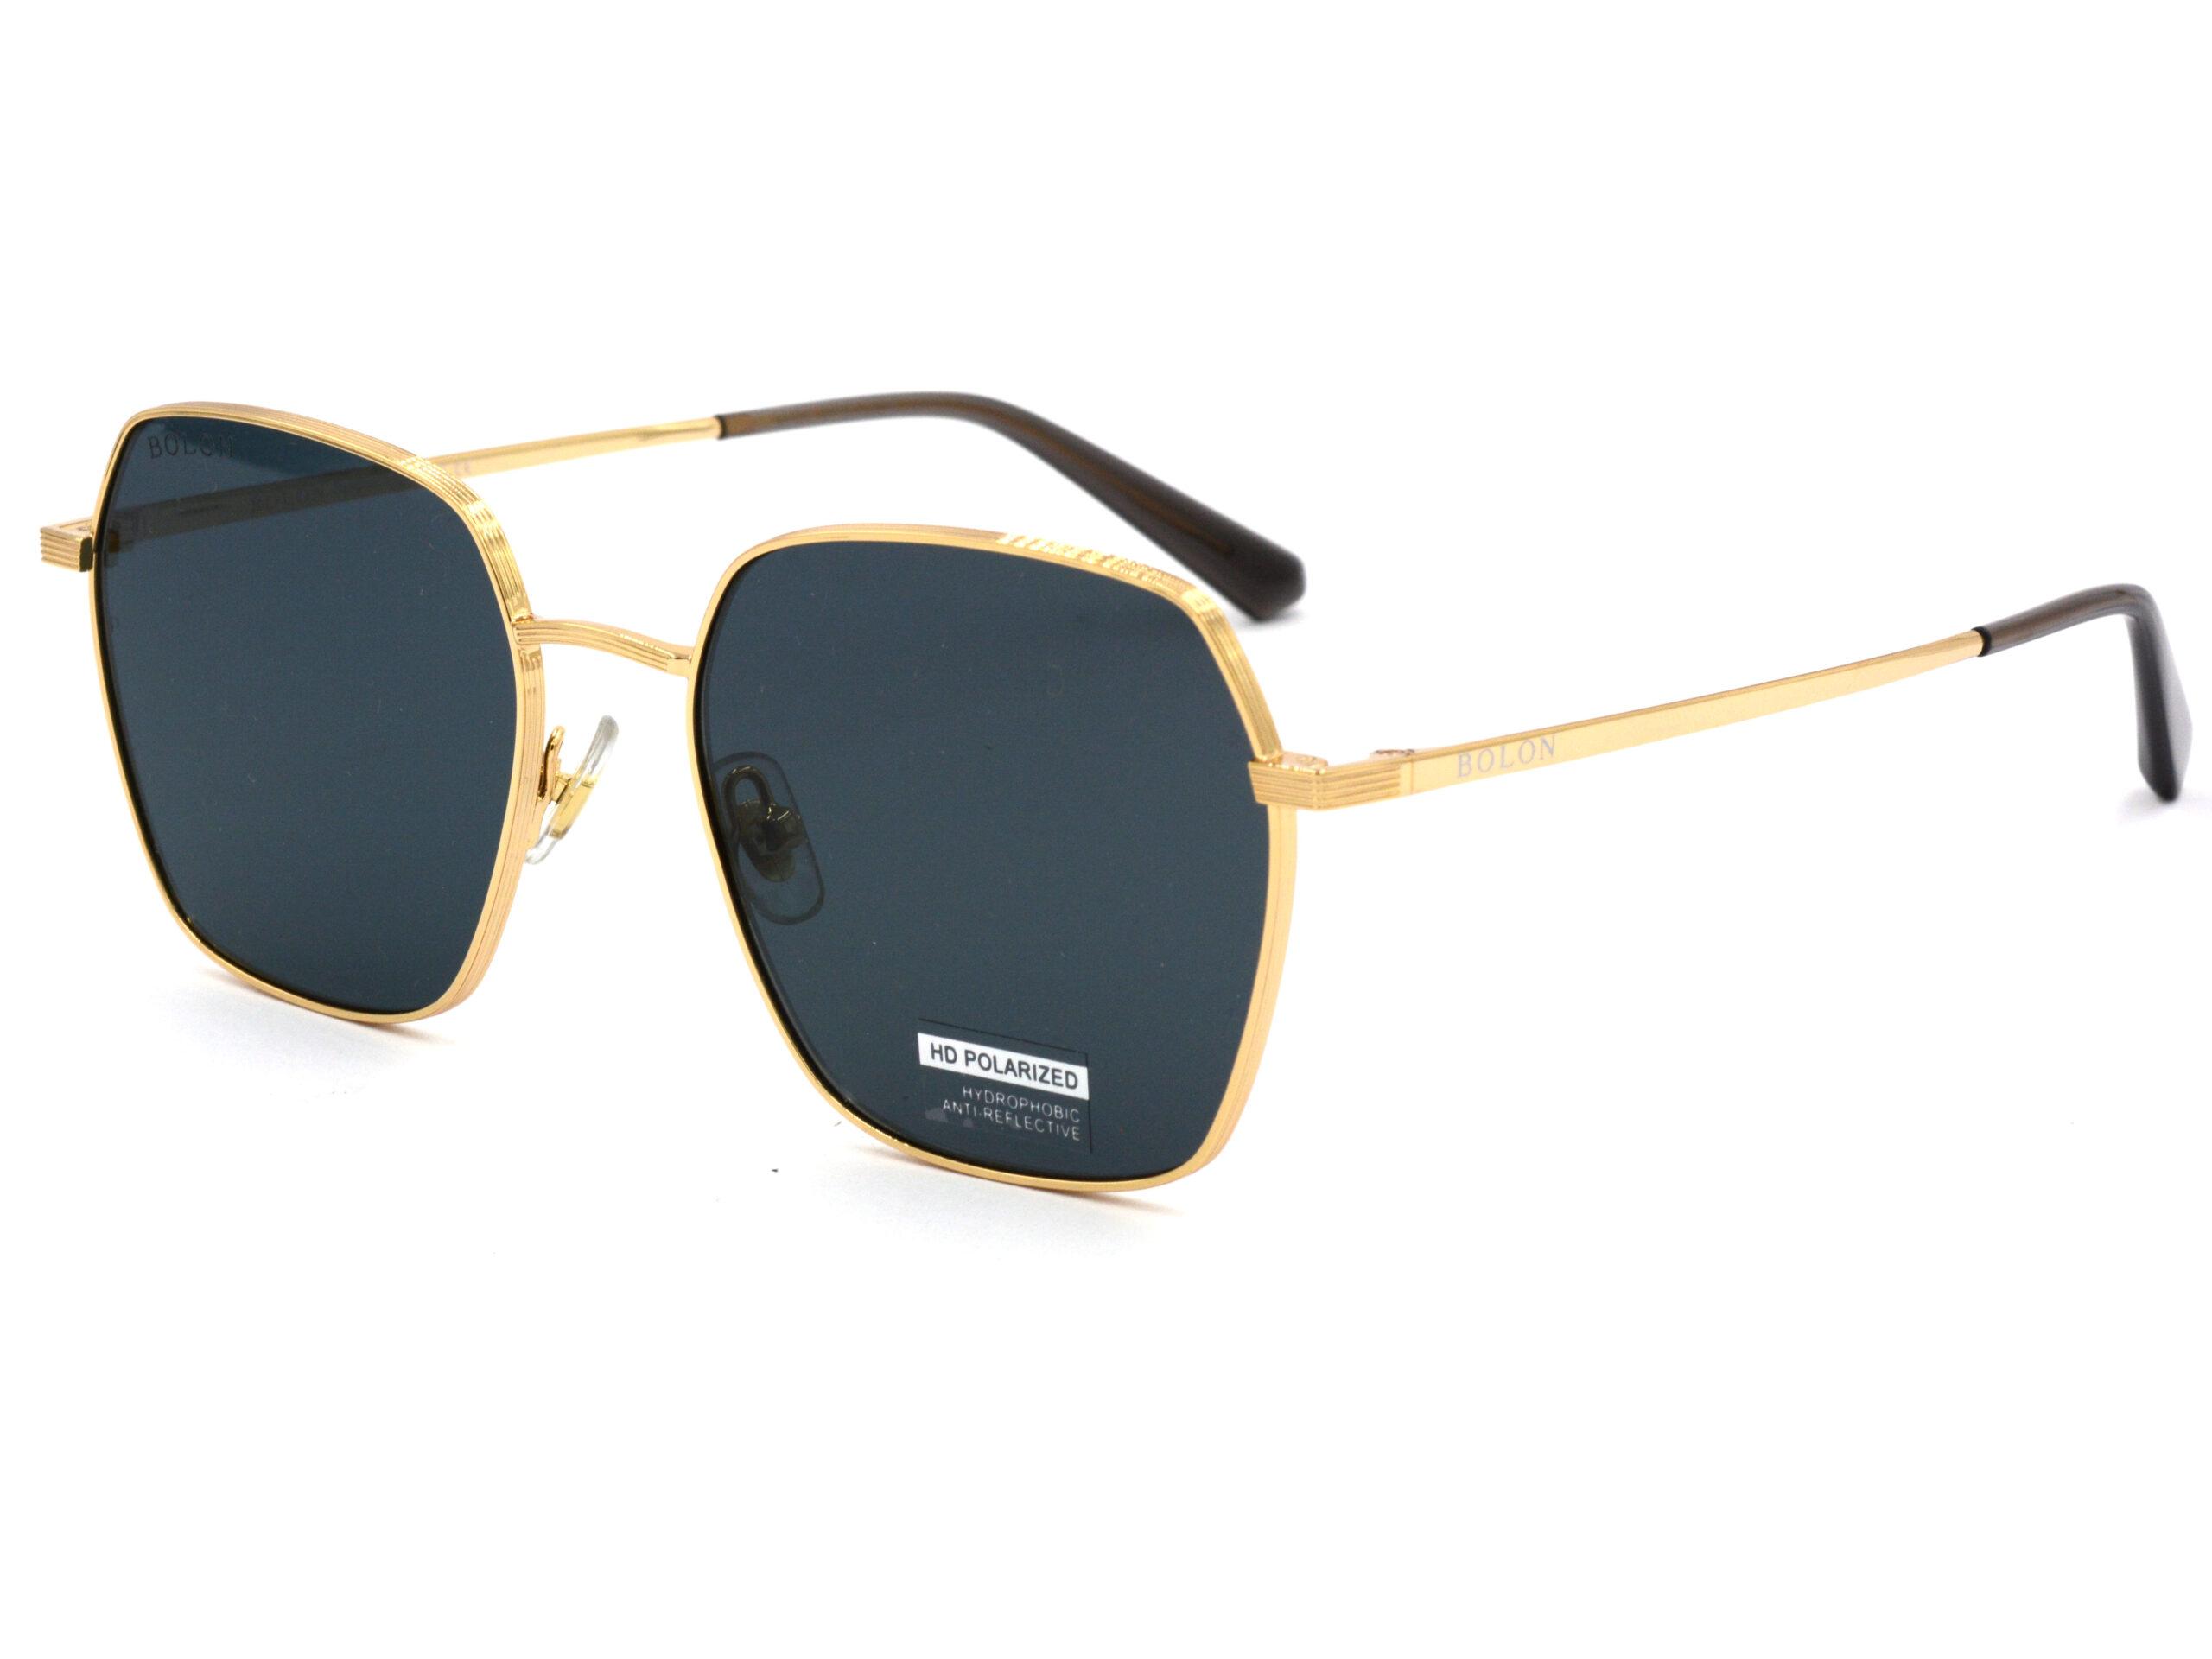 Sunglasses BOLON BL7087 C60 Unisex 2020